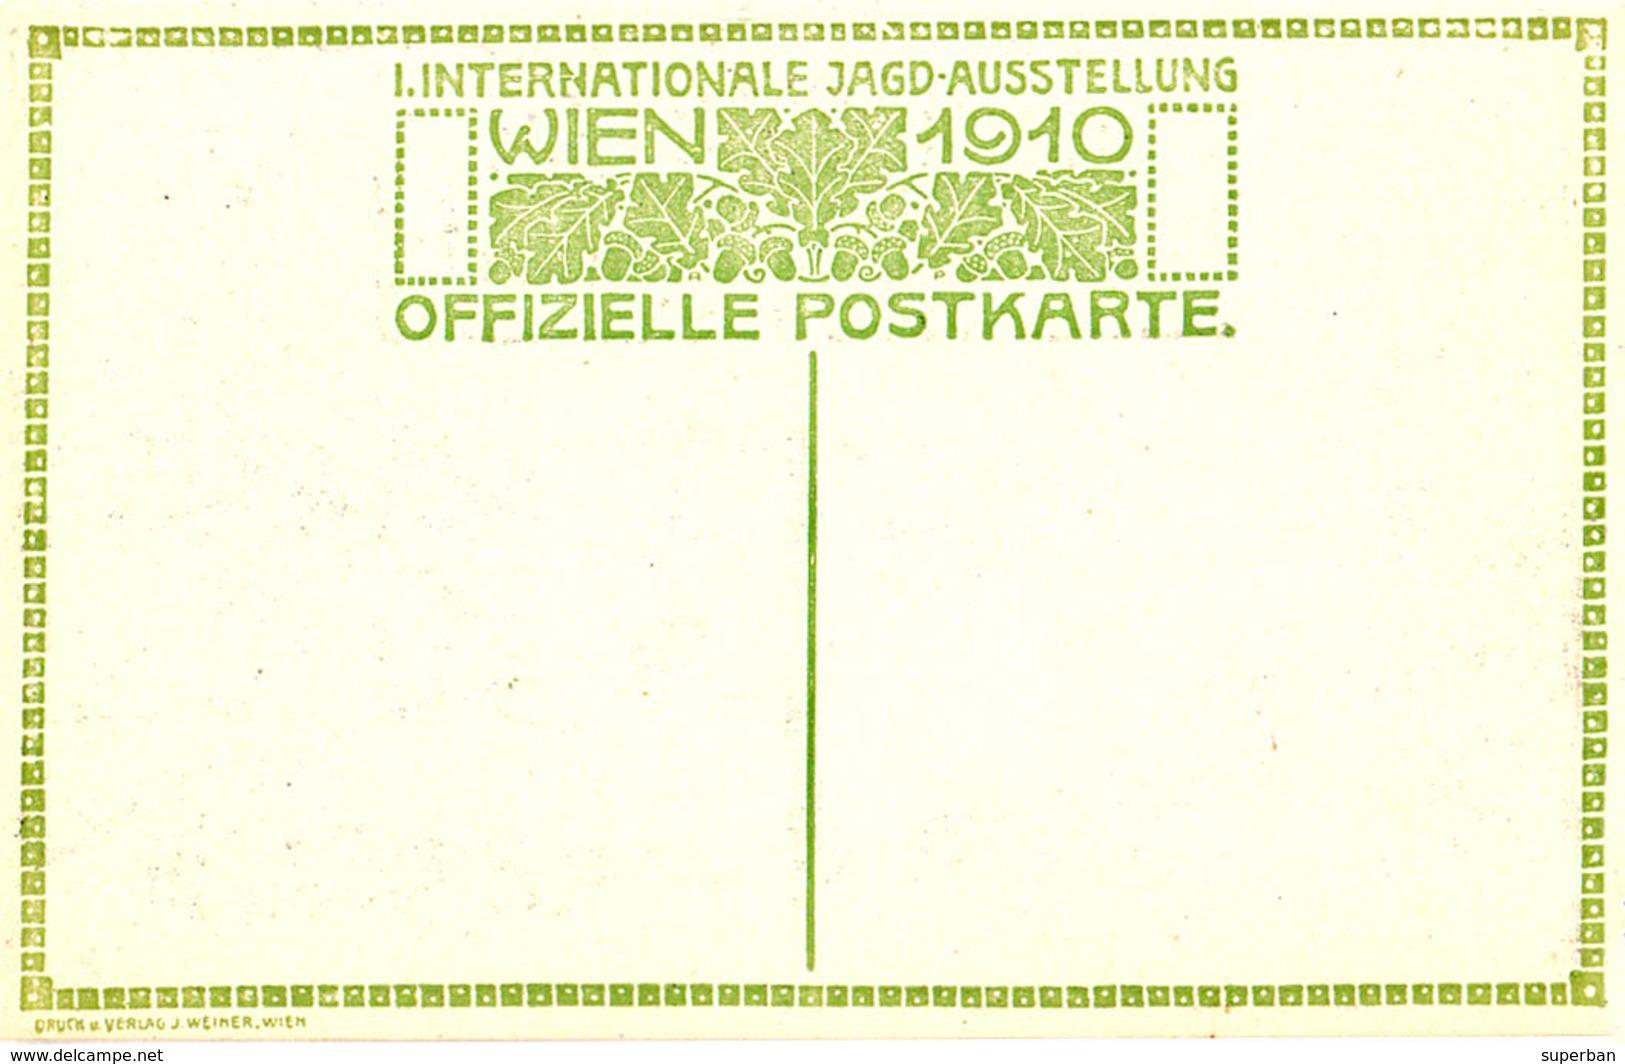 AUSTRIA / WIEN - 1910 : ERSTE INTERNATIONALE JAGD AUSSTELLUNG / EXPOSITION De CHASSE / HUNTING EXHIBITION (aa614) - Caccia